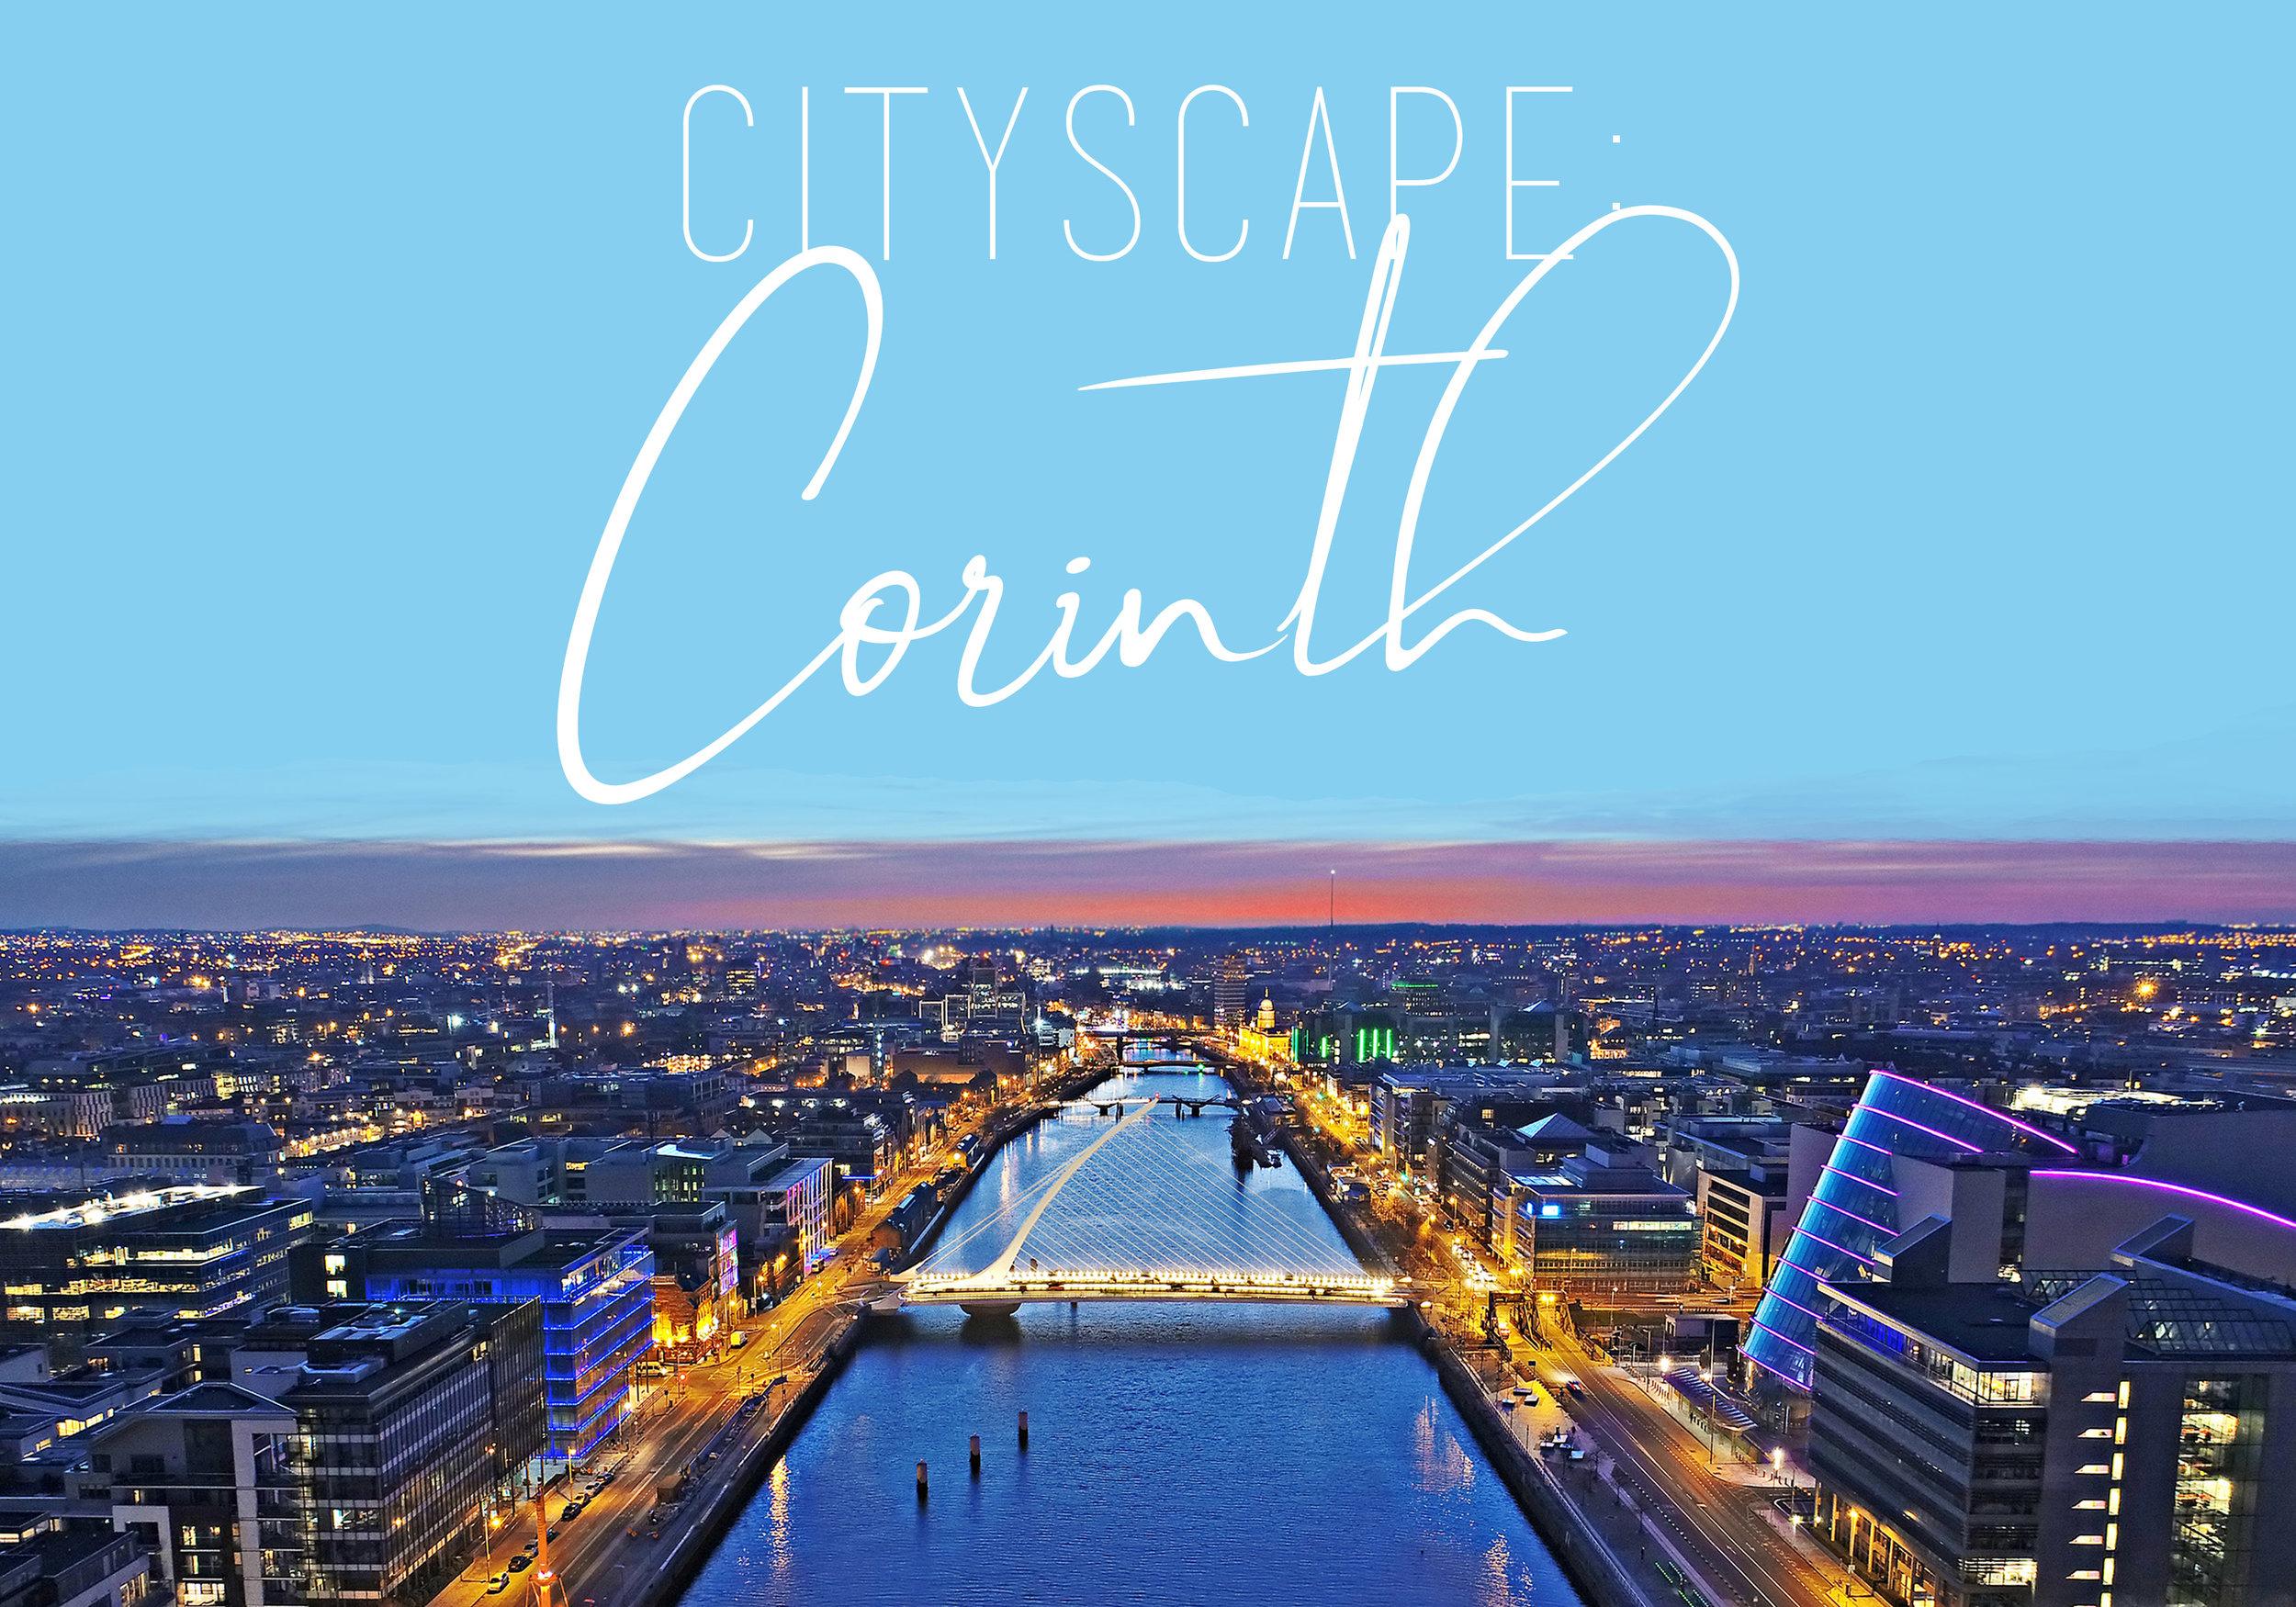 Cityscape Title 2.jpg